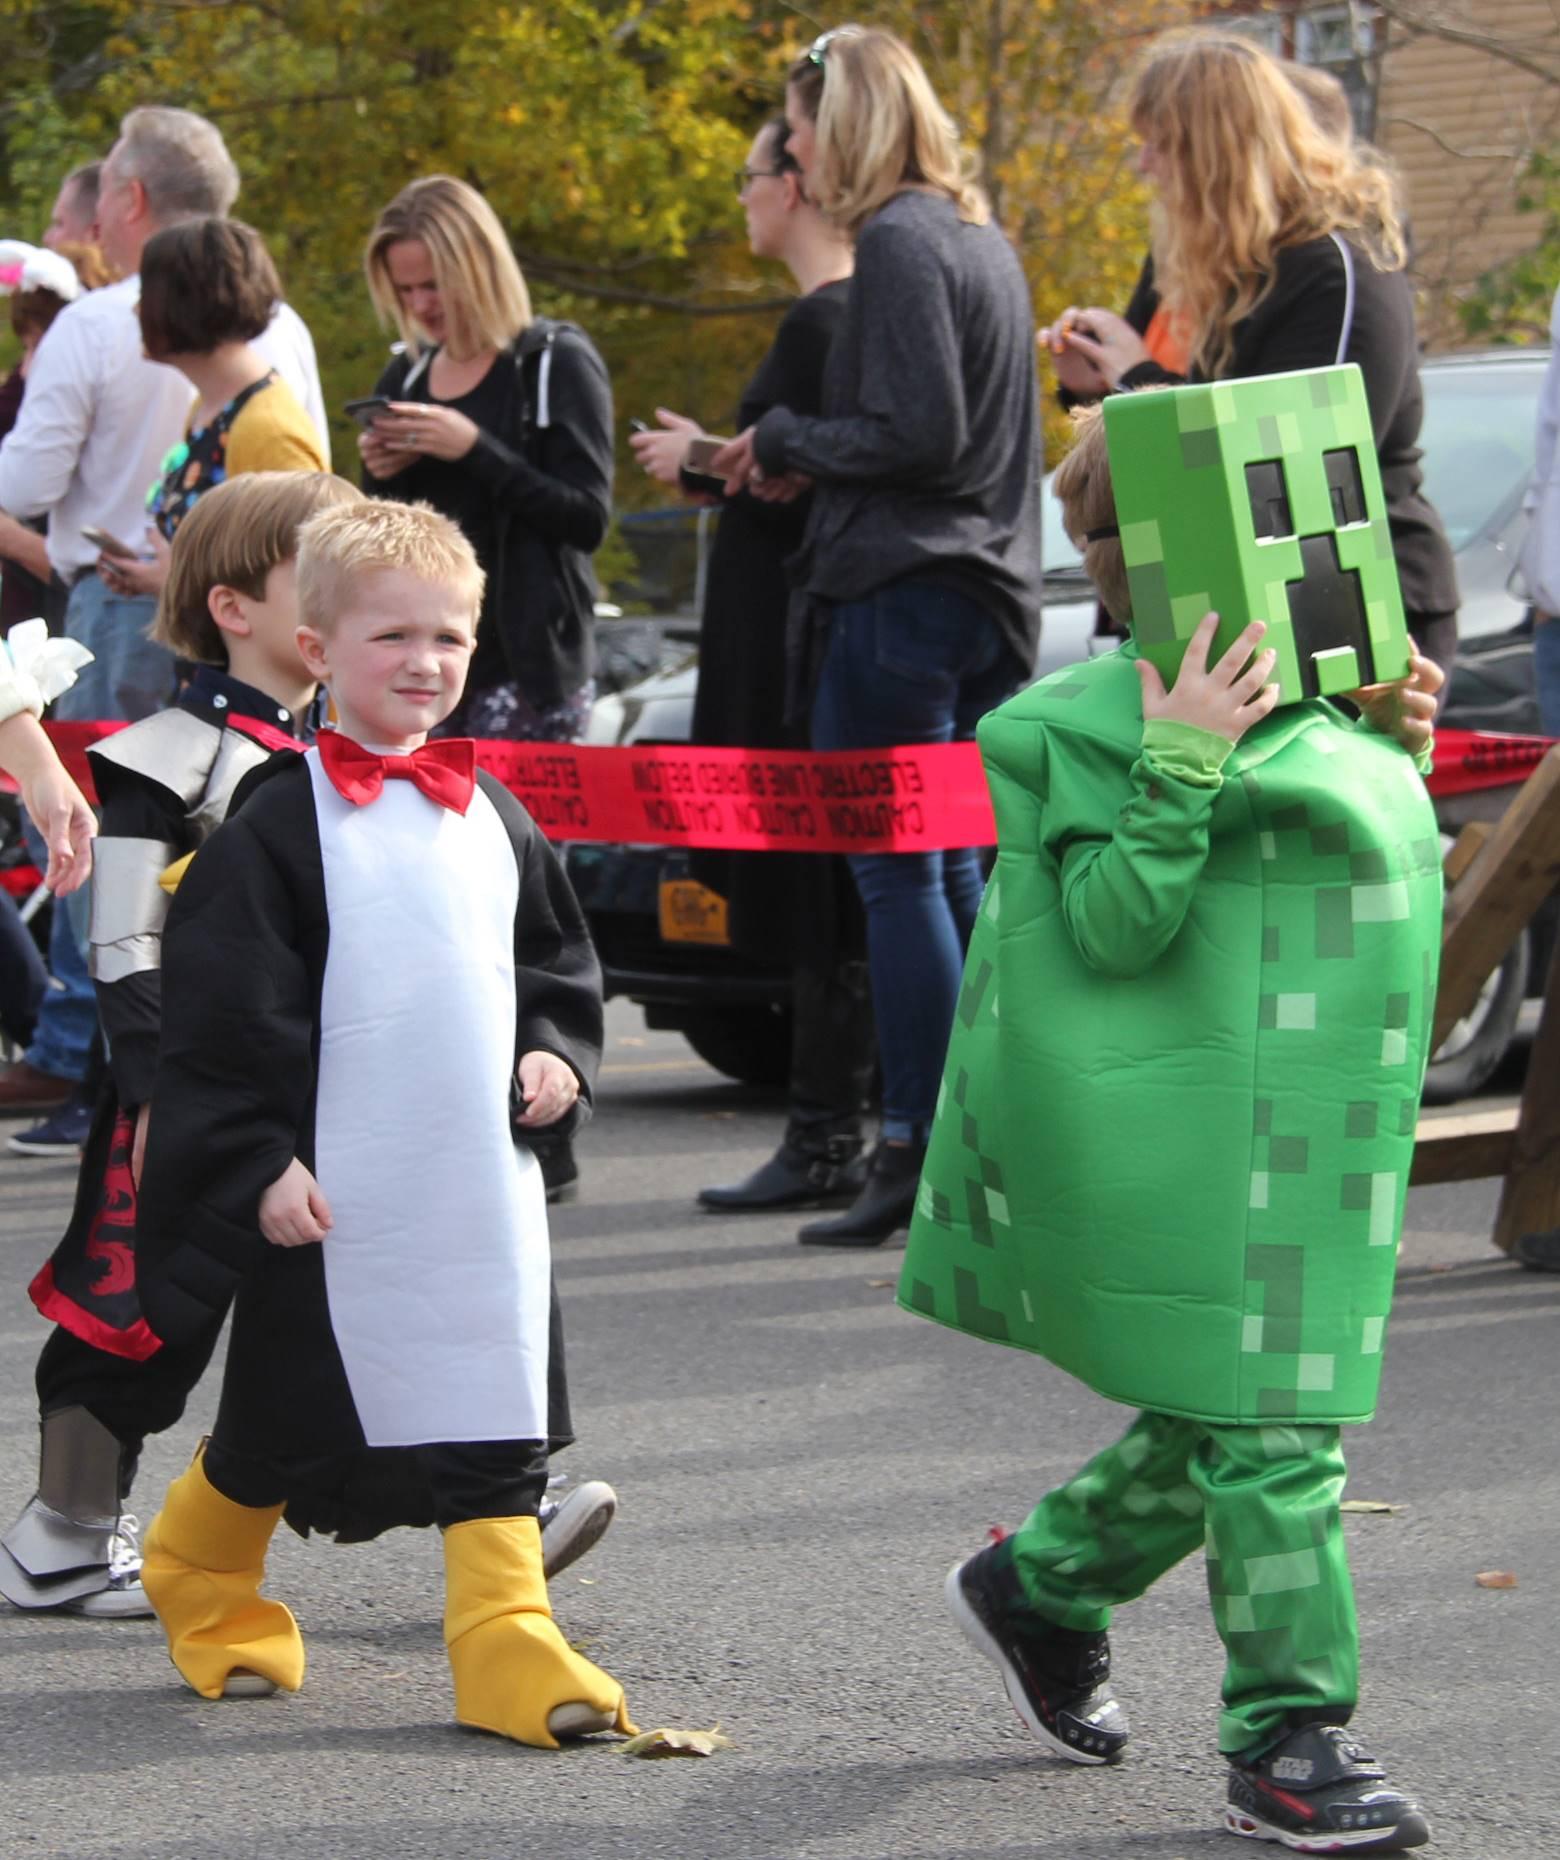 students walking wearing costumes